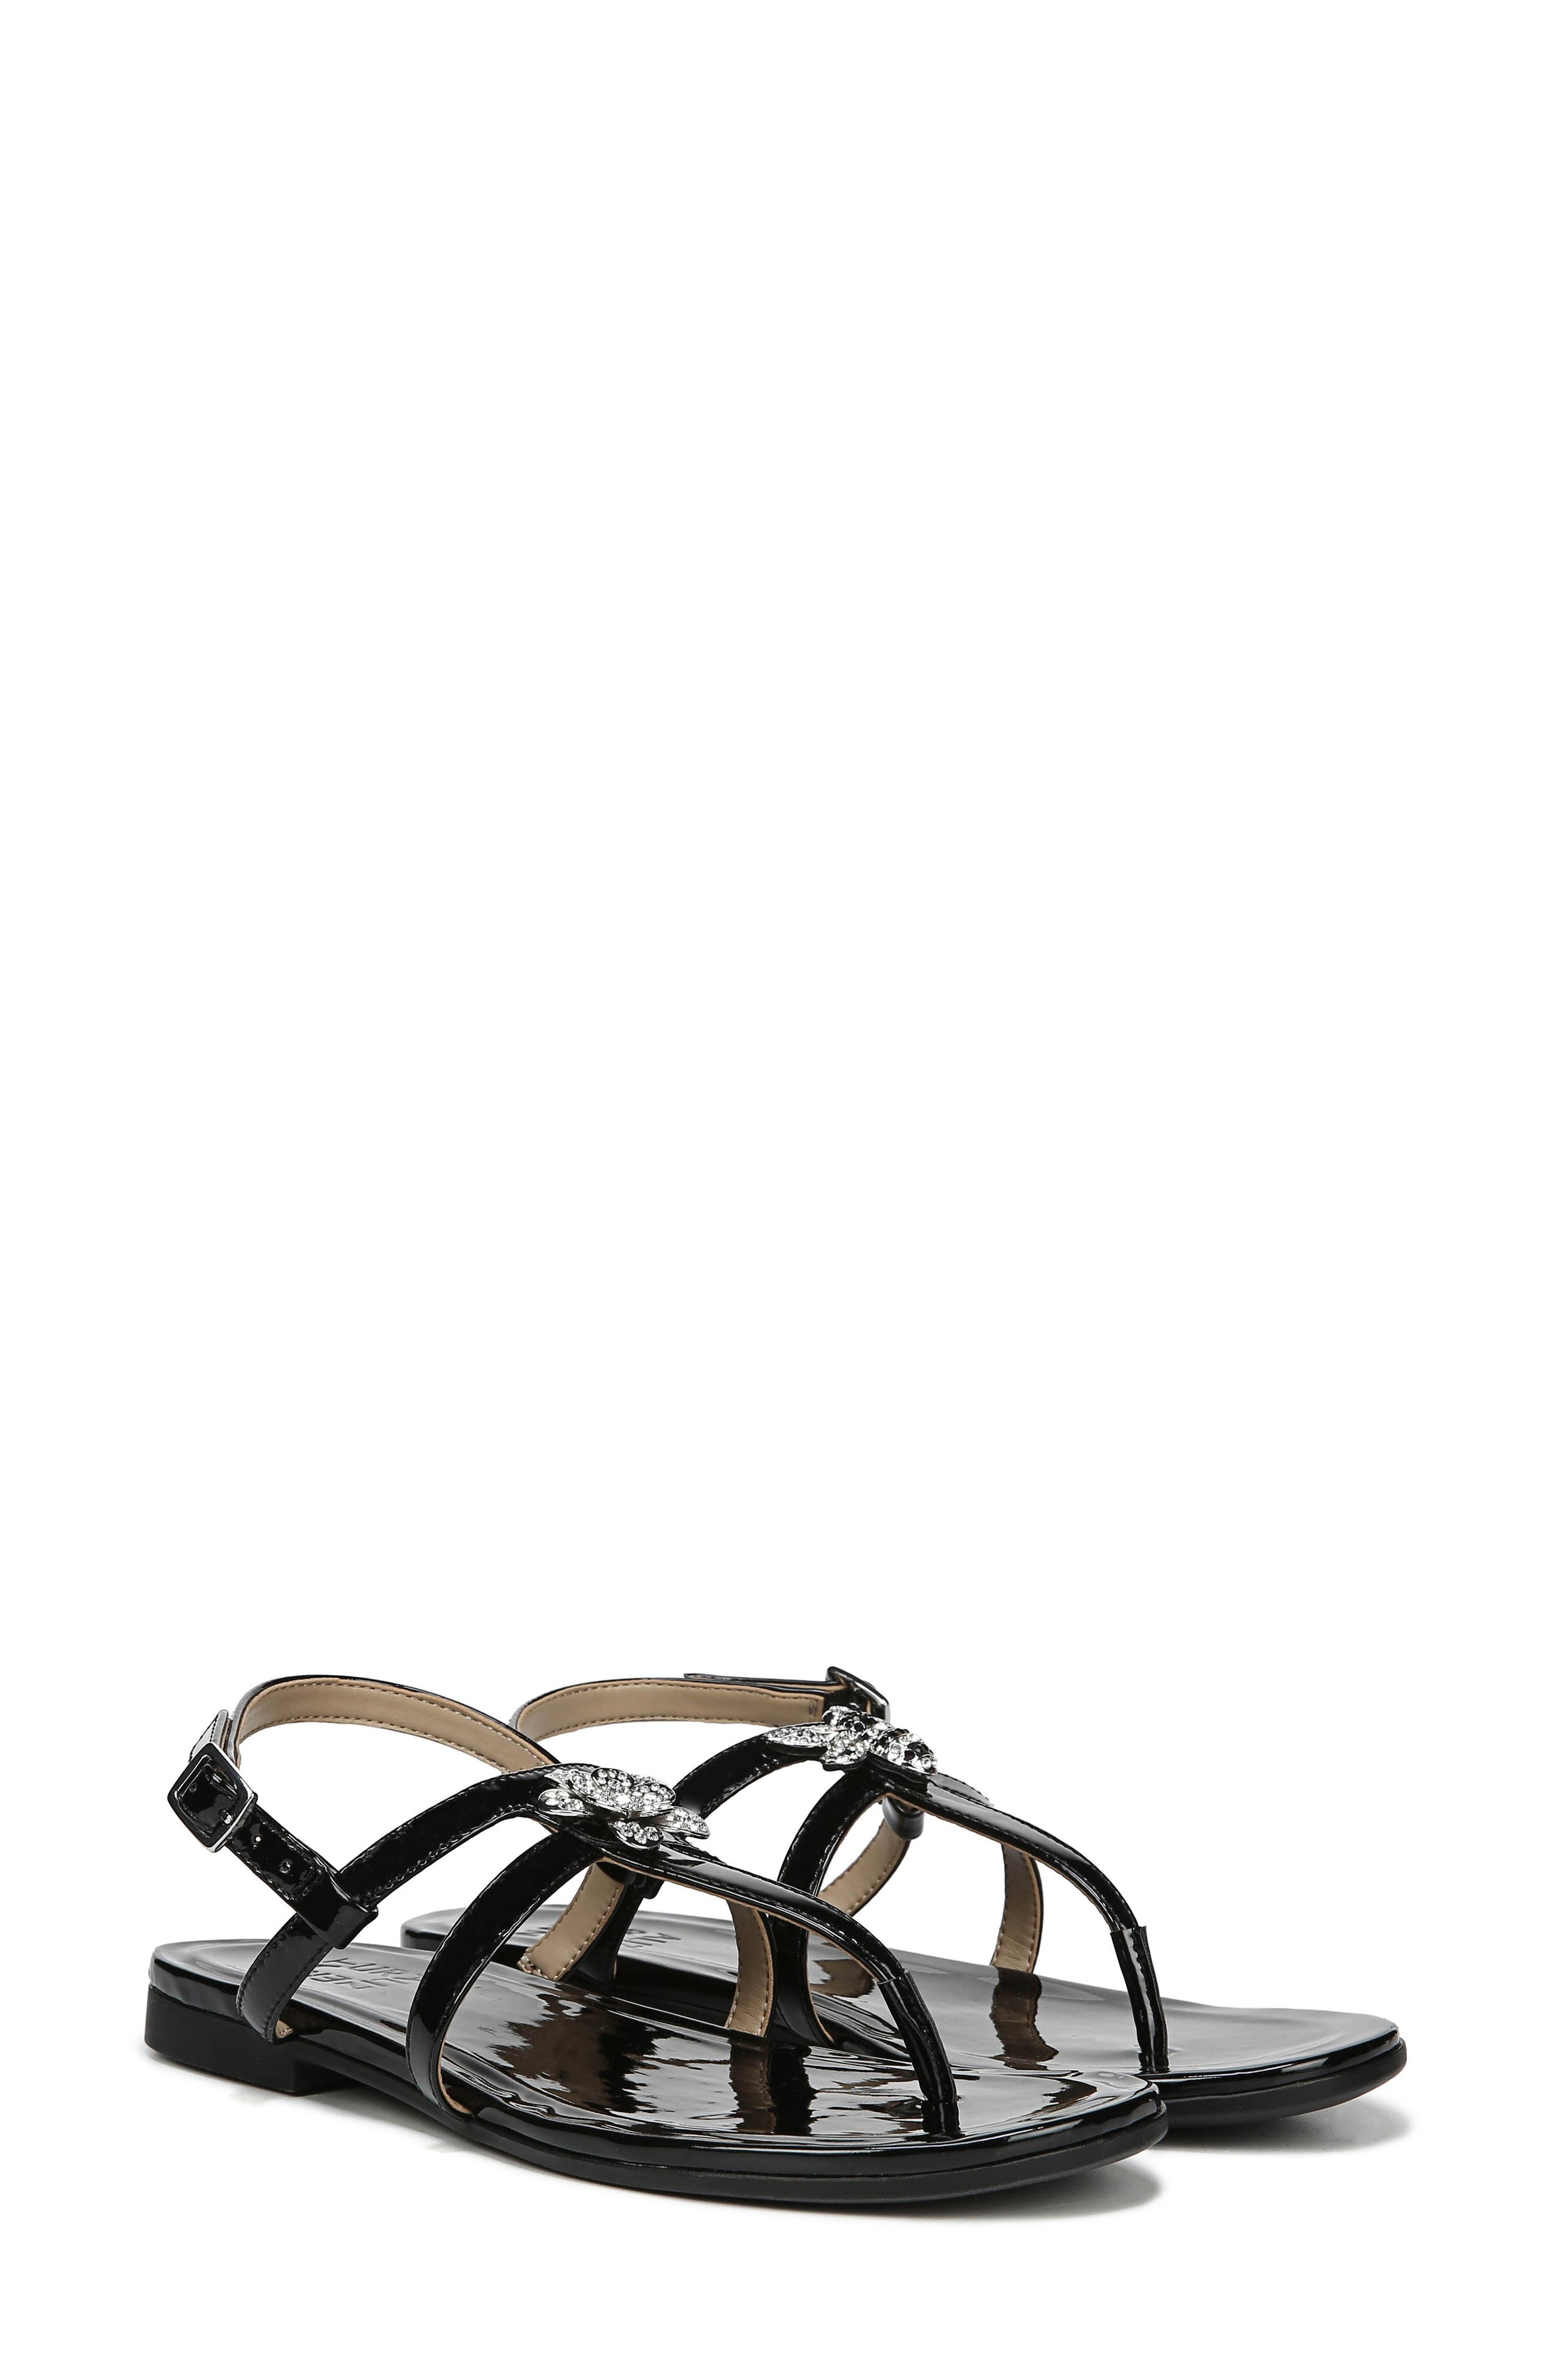 Tilly Embellished Sandal,                             Alternate thumbnail 8, color,                             BLACK PATENT FAUX LEATHER